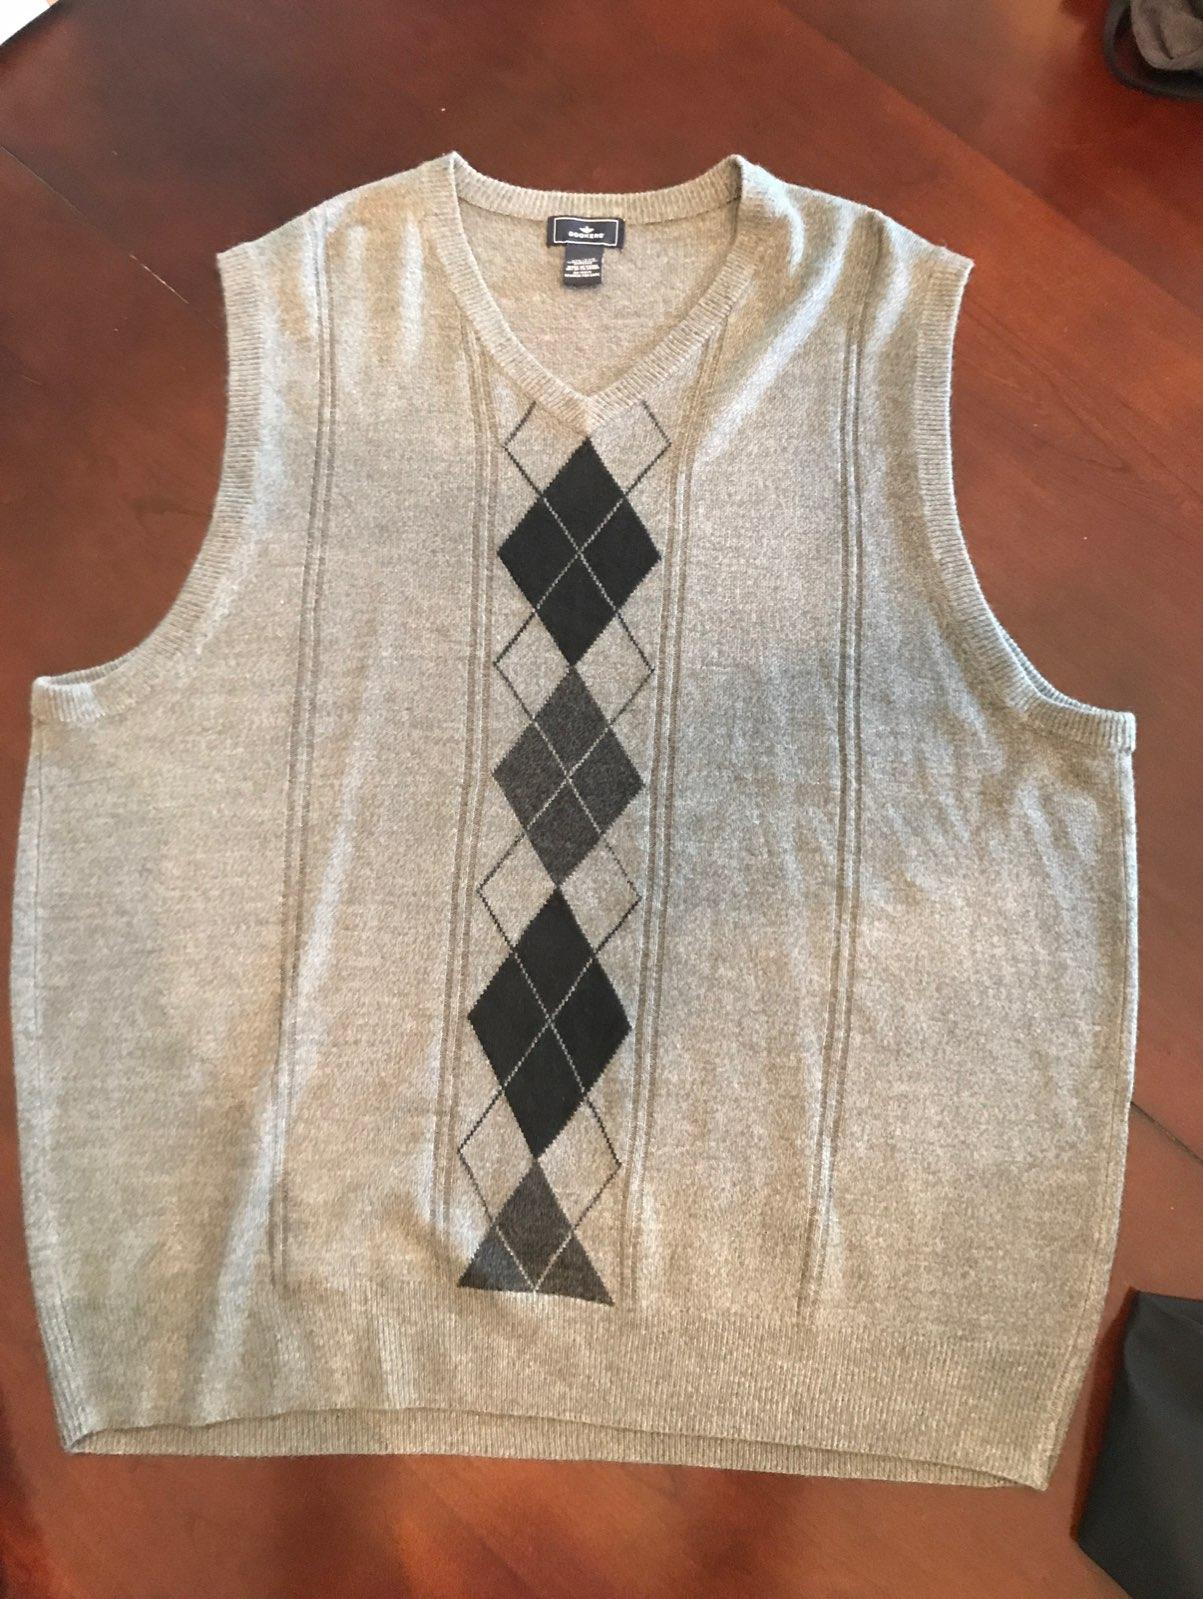 Dockers Sweater Vest - Mercari: BUY & SELL THINGS YOU LOVE